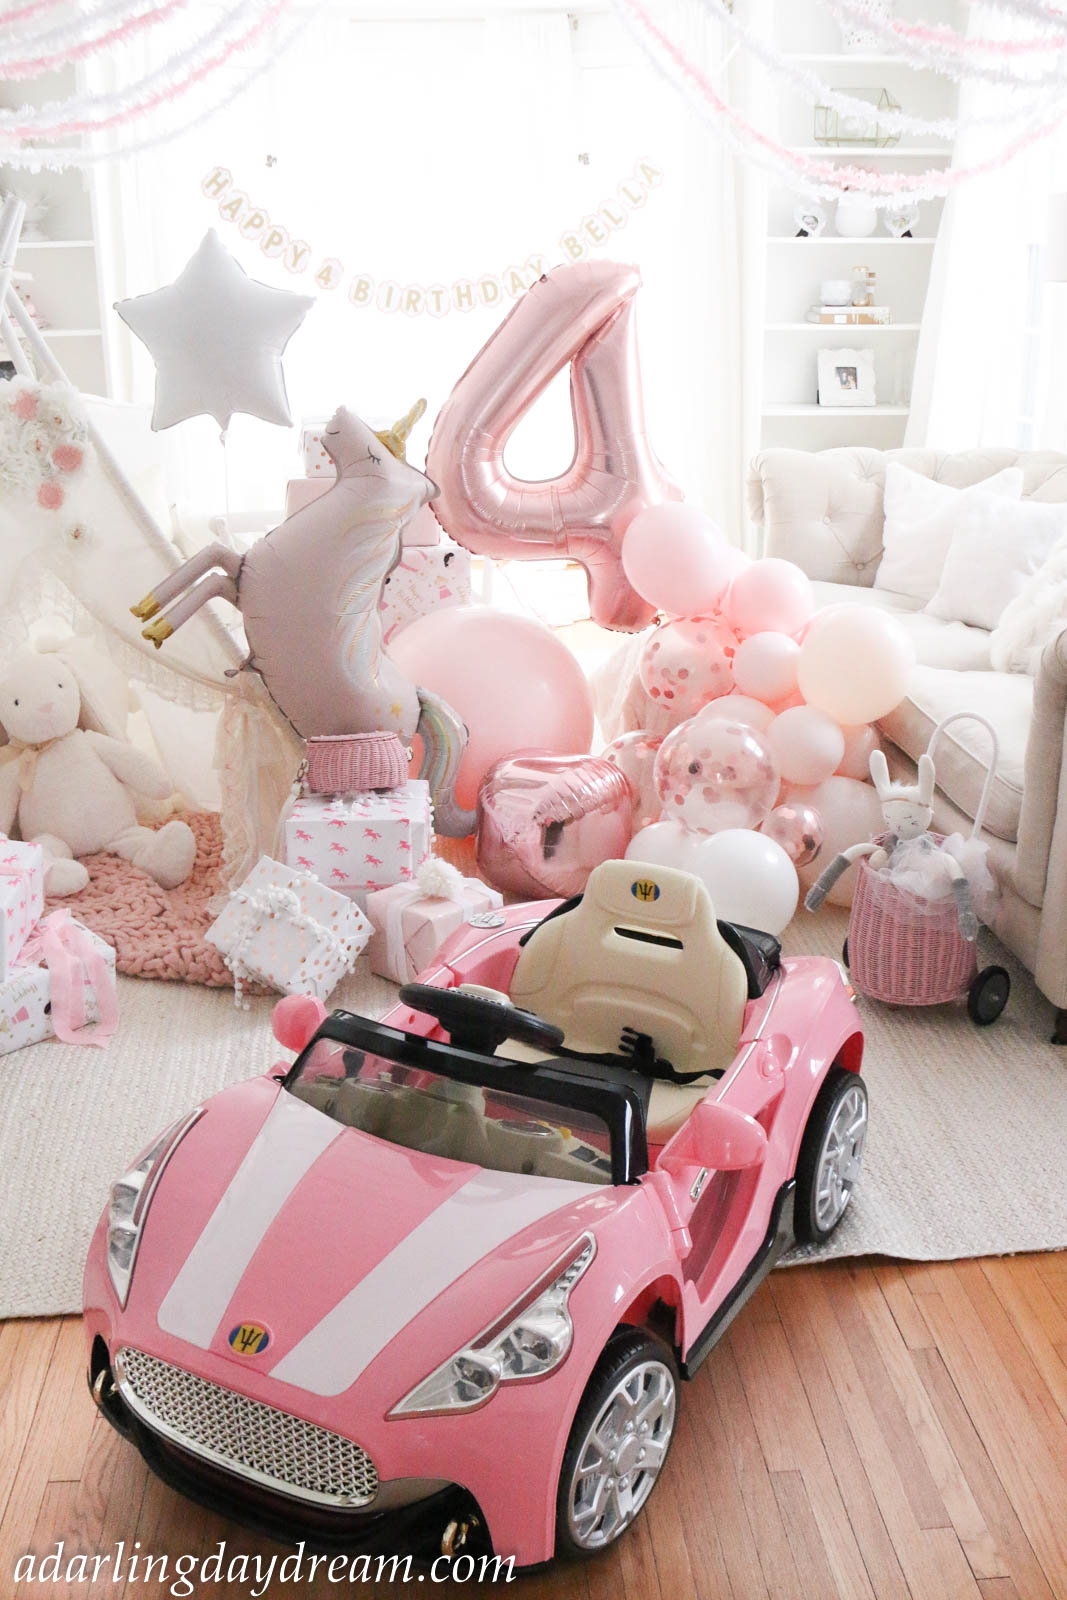 Bella-s-4th-Birthday-morning-surprise-17